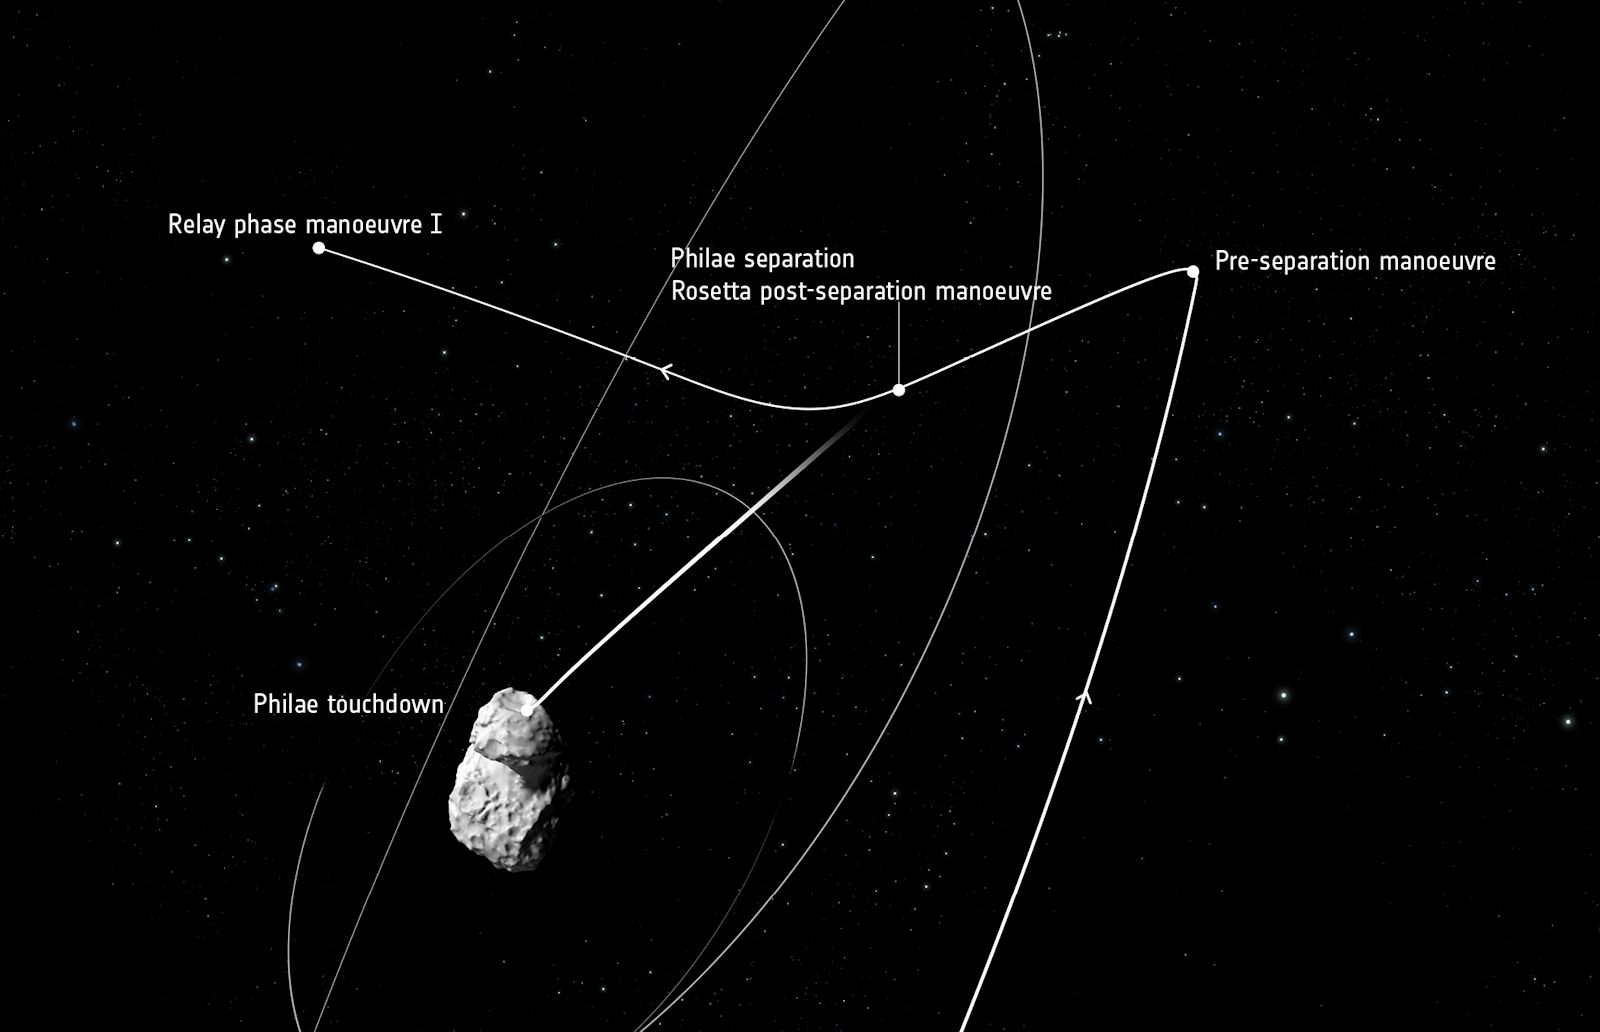 Rosetta - Approche comète et séparation Philae - Chute libre Philae - Manoeuvre - ESA